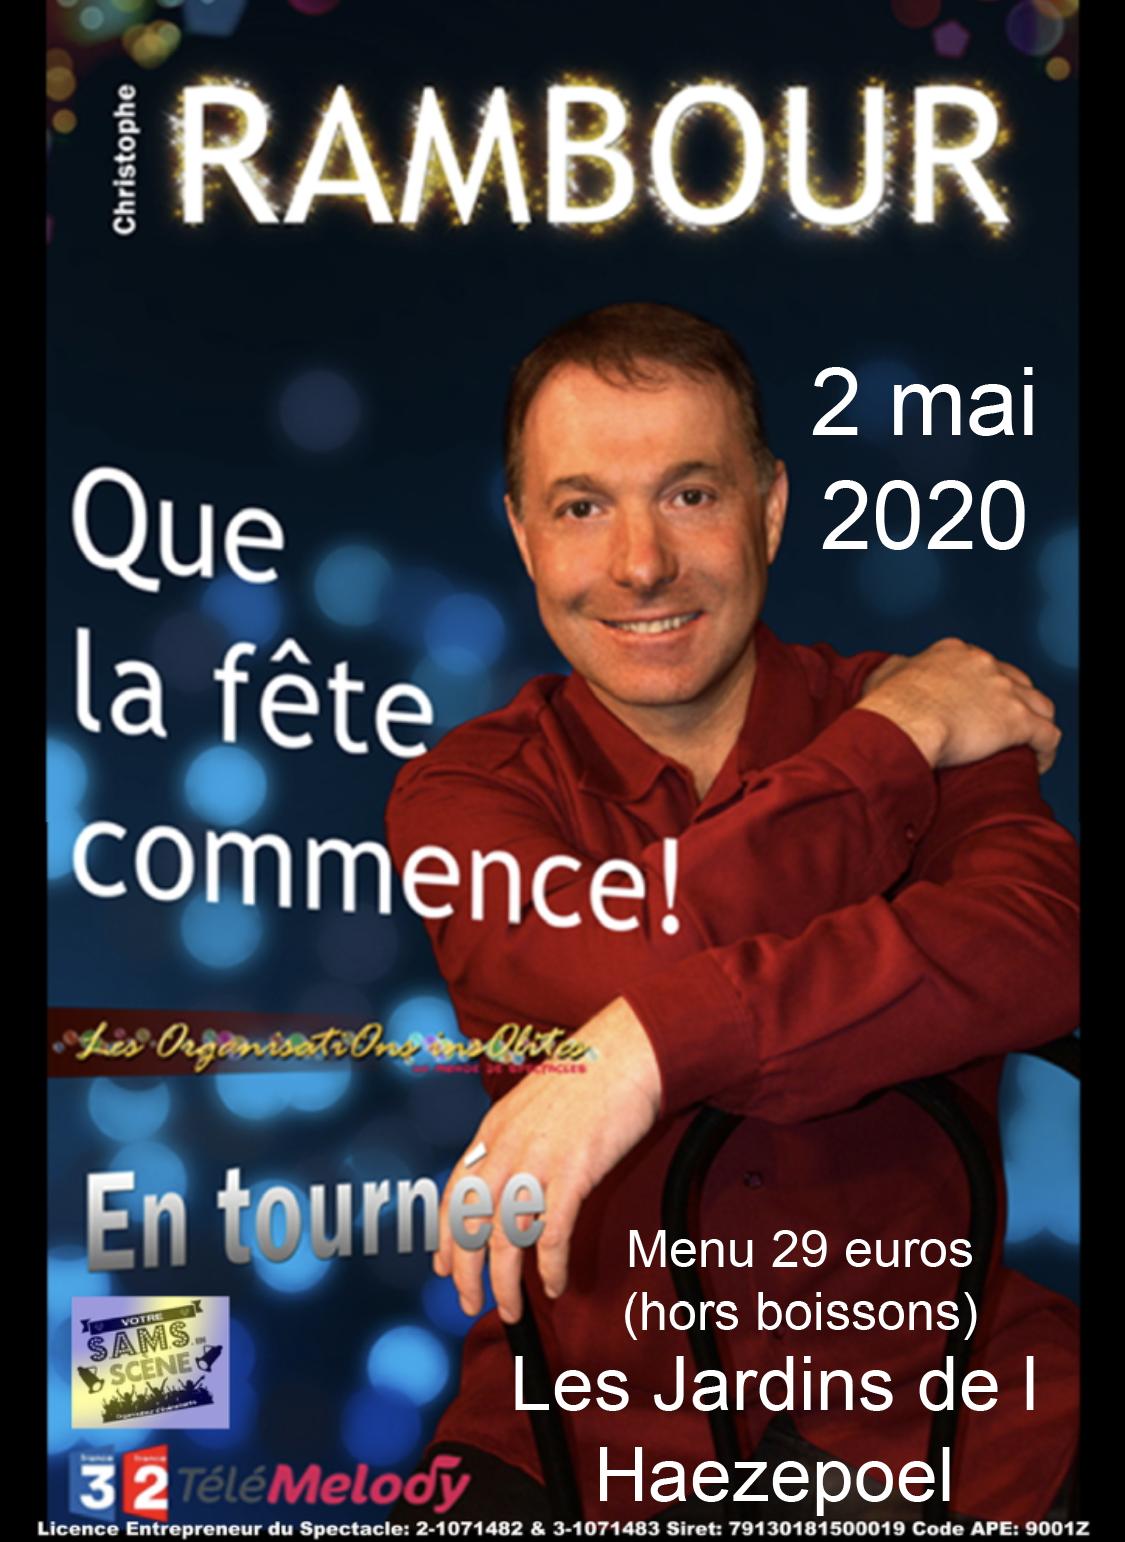 Christophe Rambour